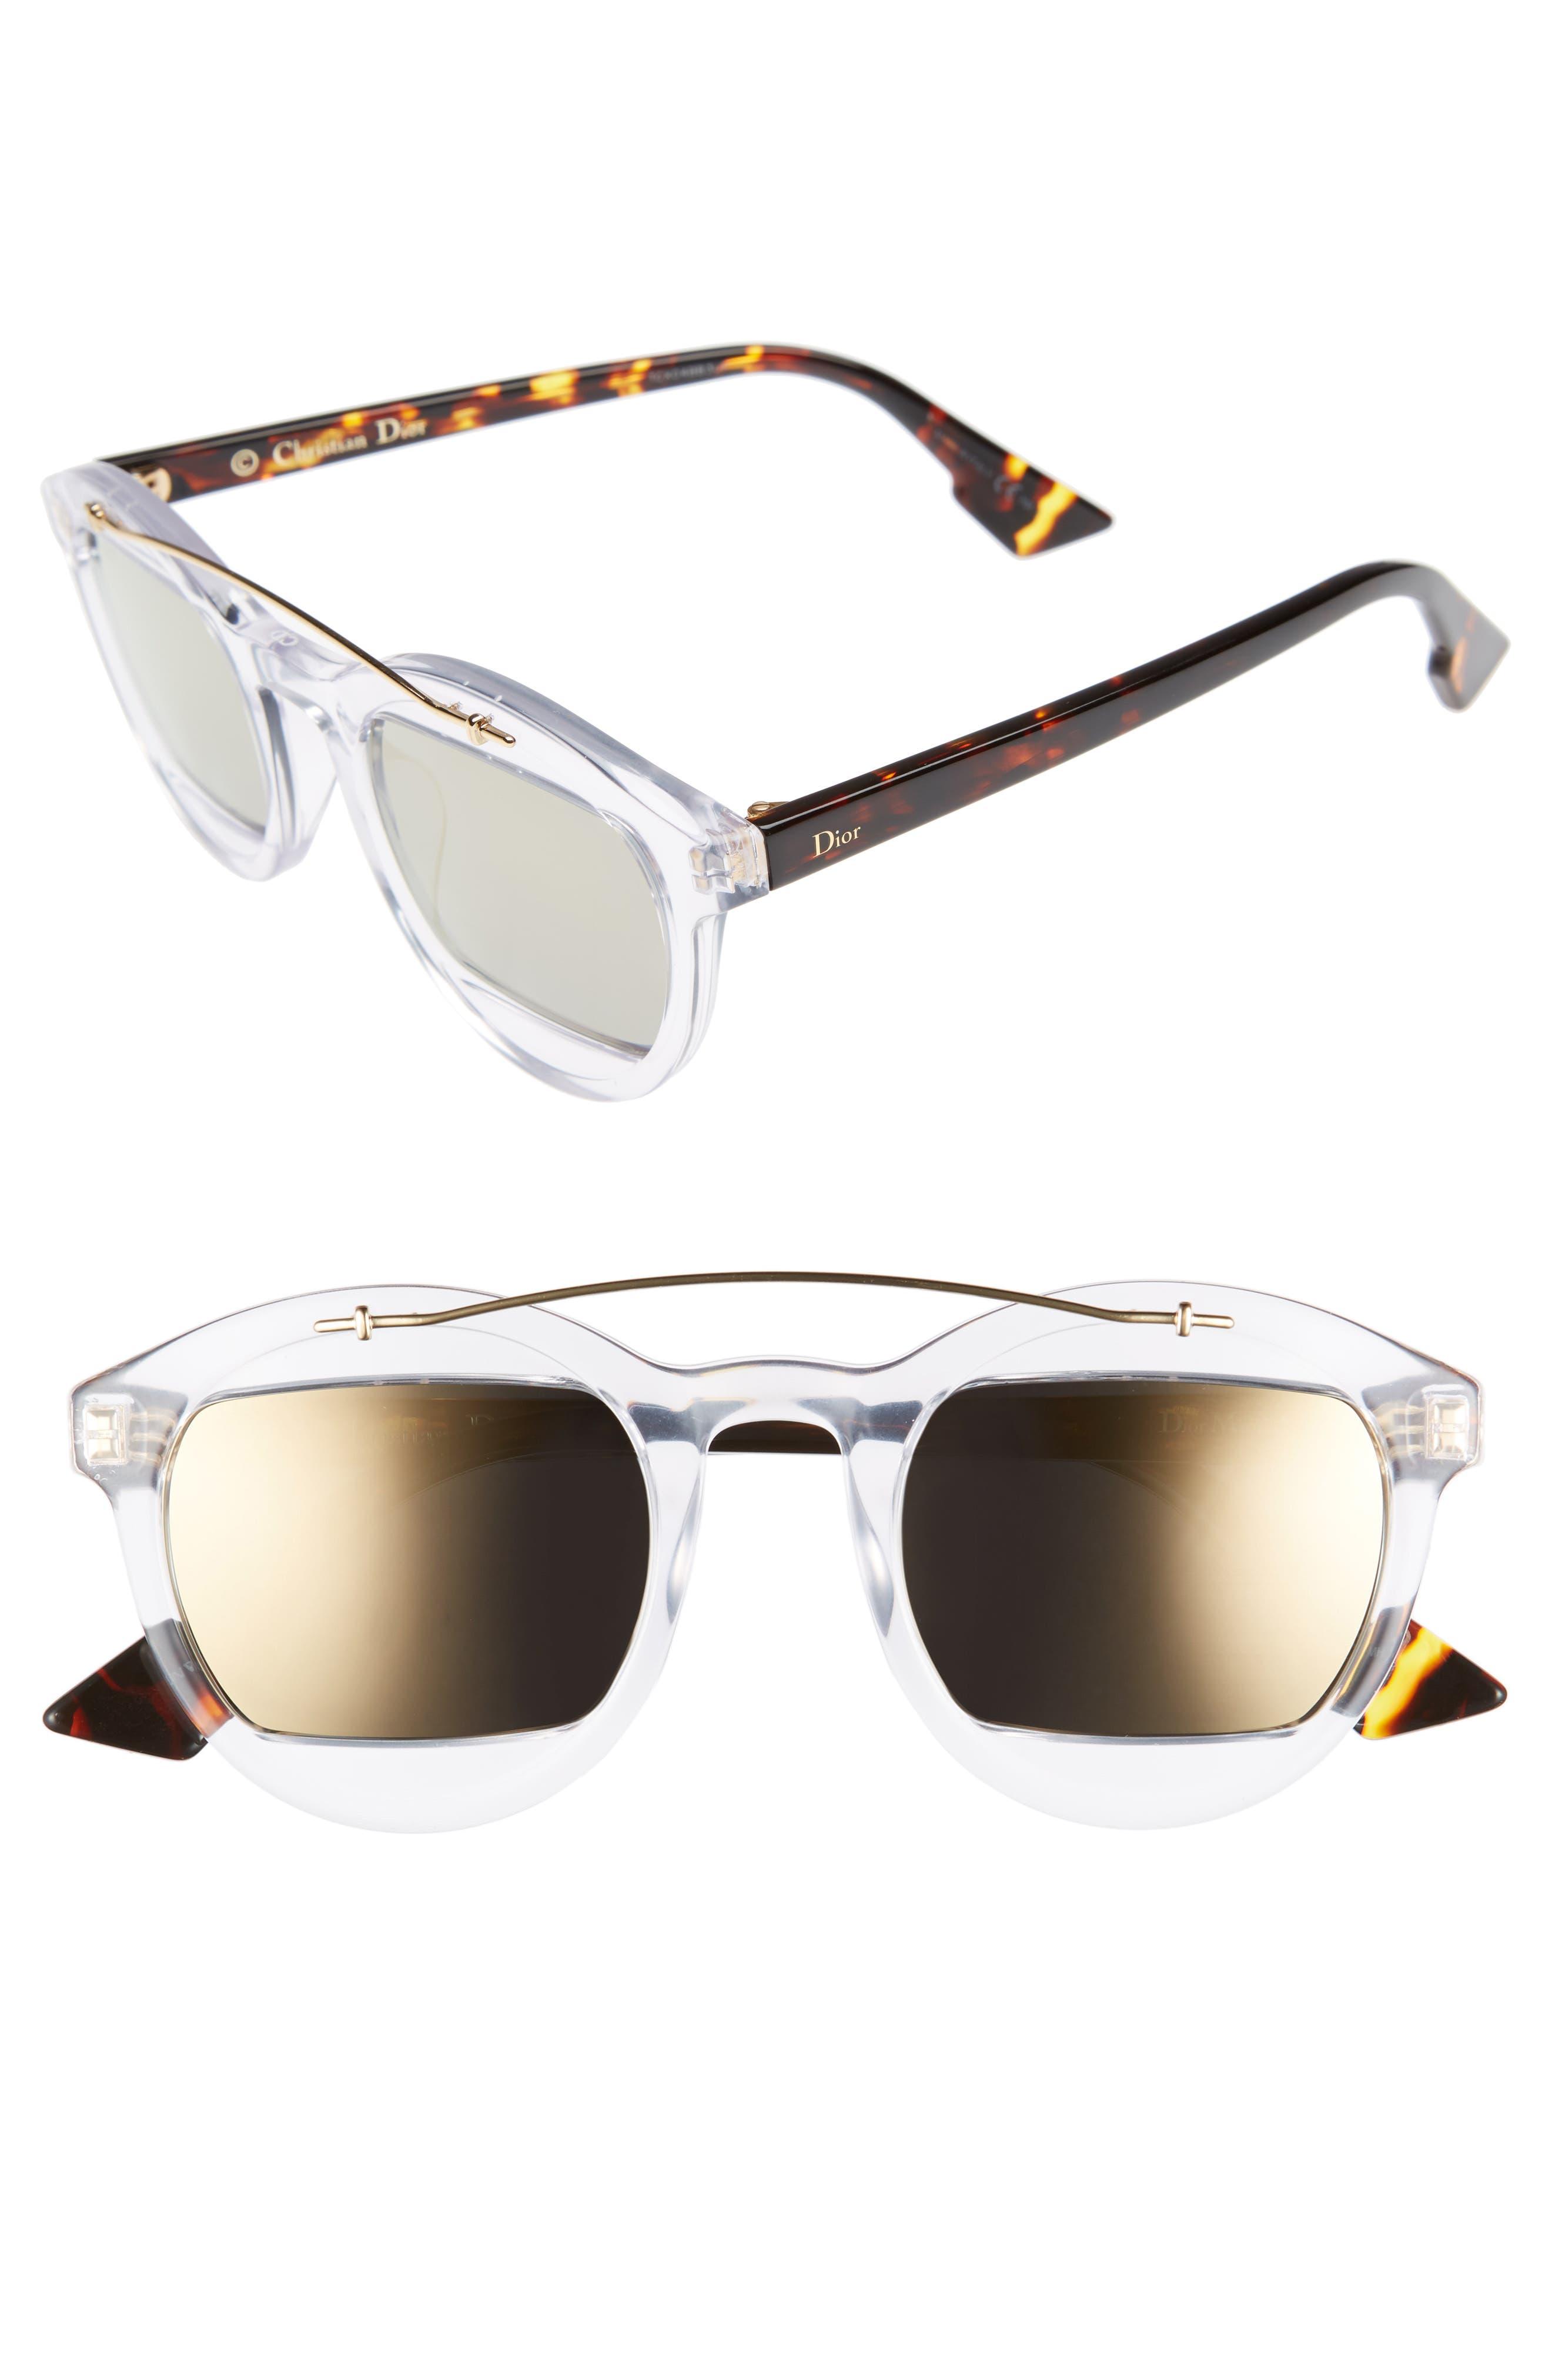 Main Image - Dior Mania 50mm Sunglasses